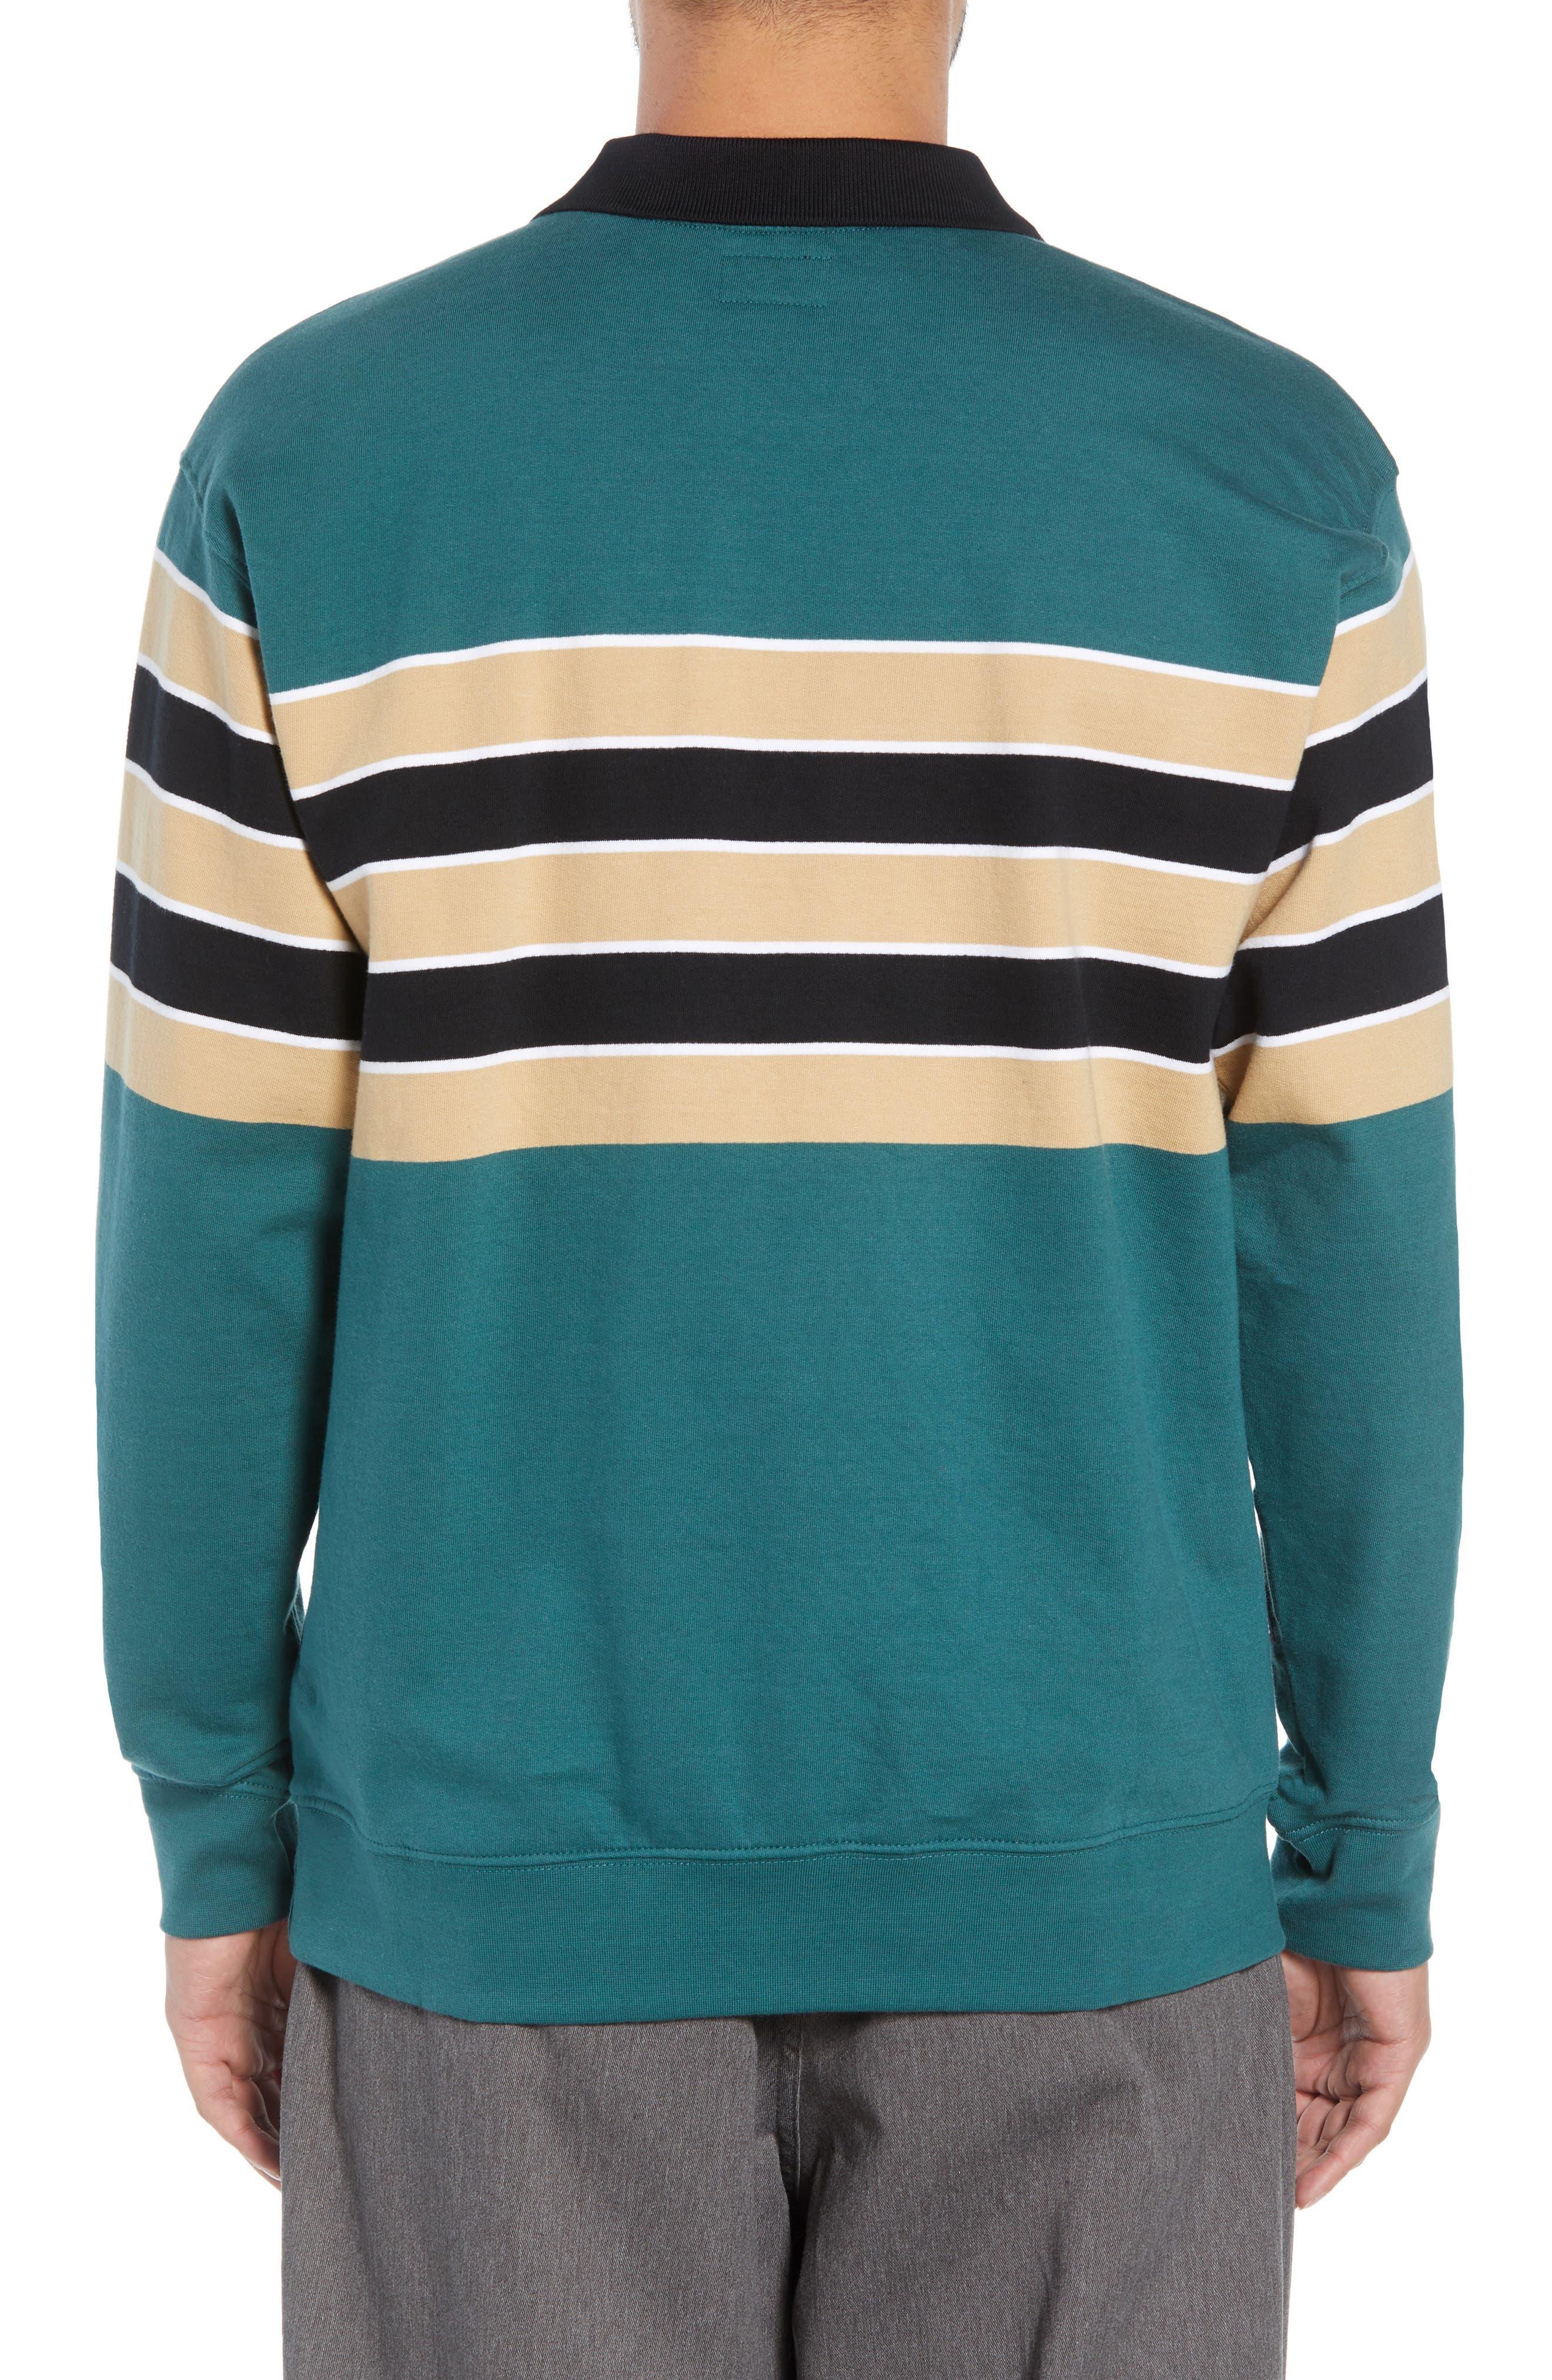 Cupid Striped Polo Collar Sweatshirt,                             Alternate thumbnail 2, color,                             DARK TEAL MULTI